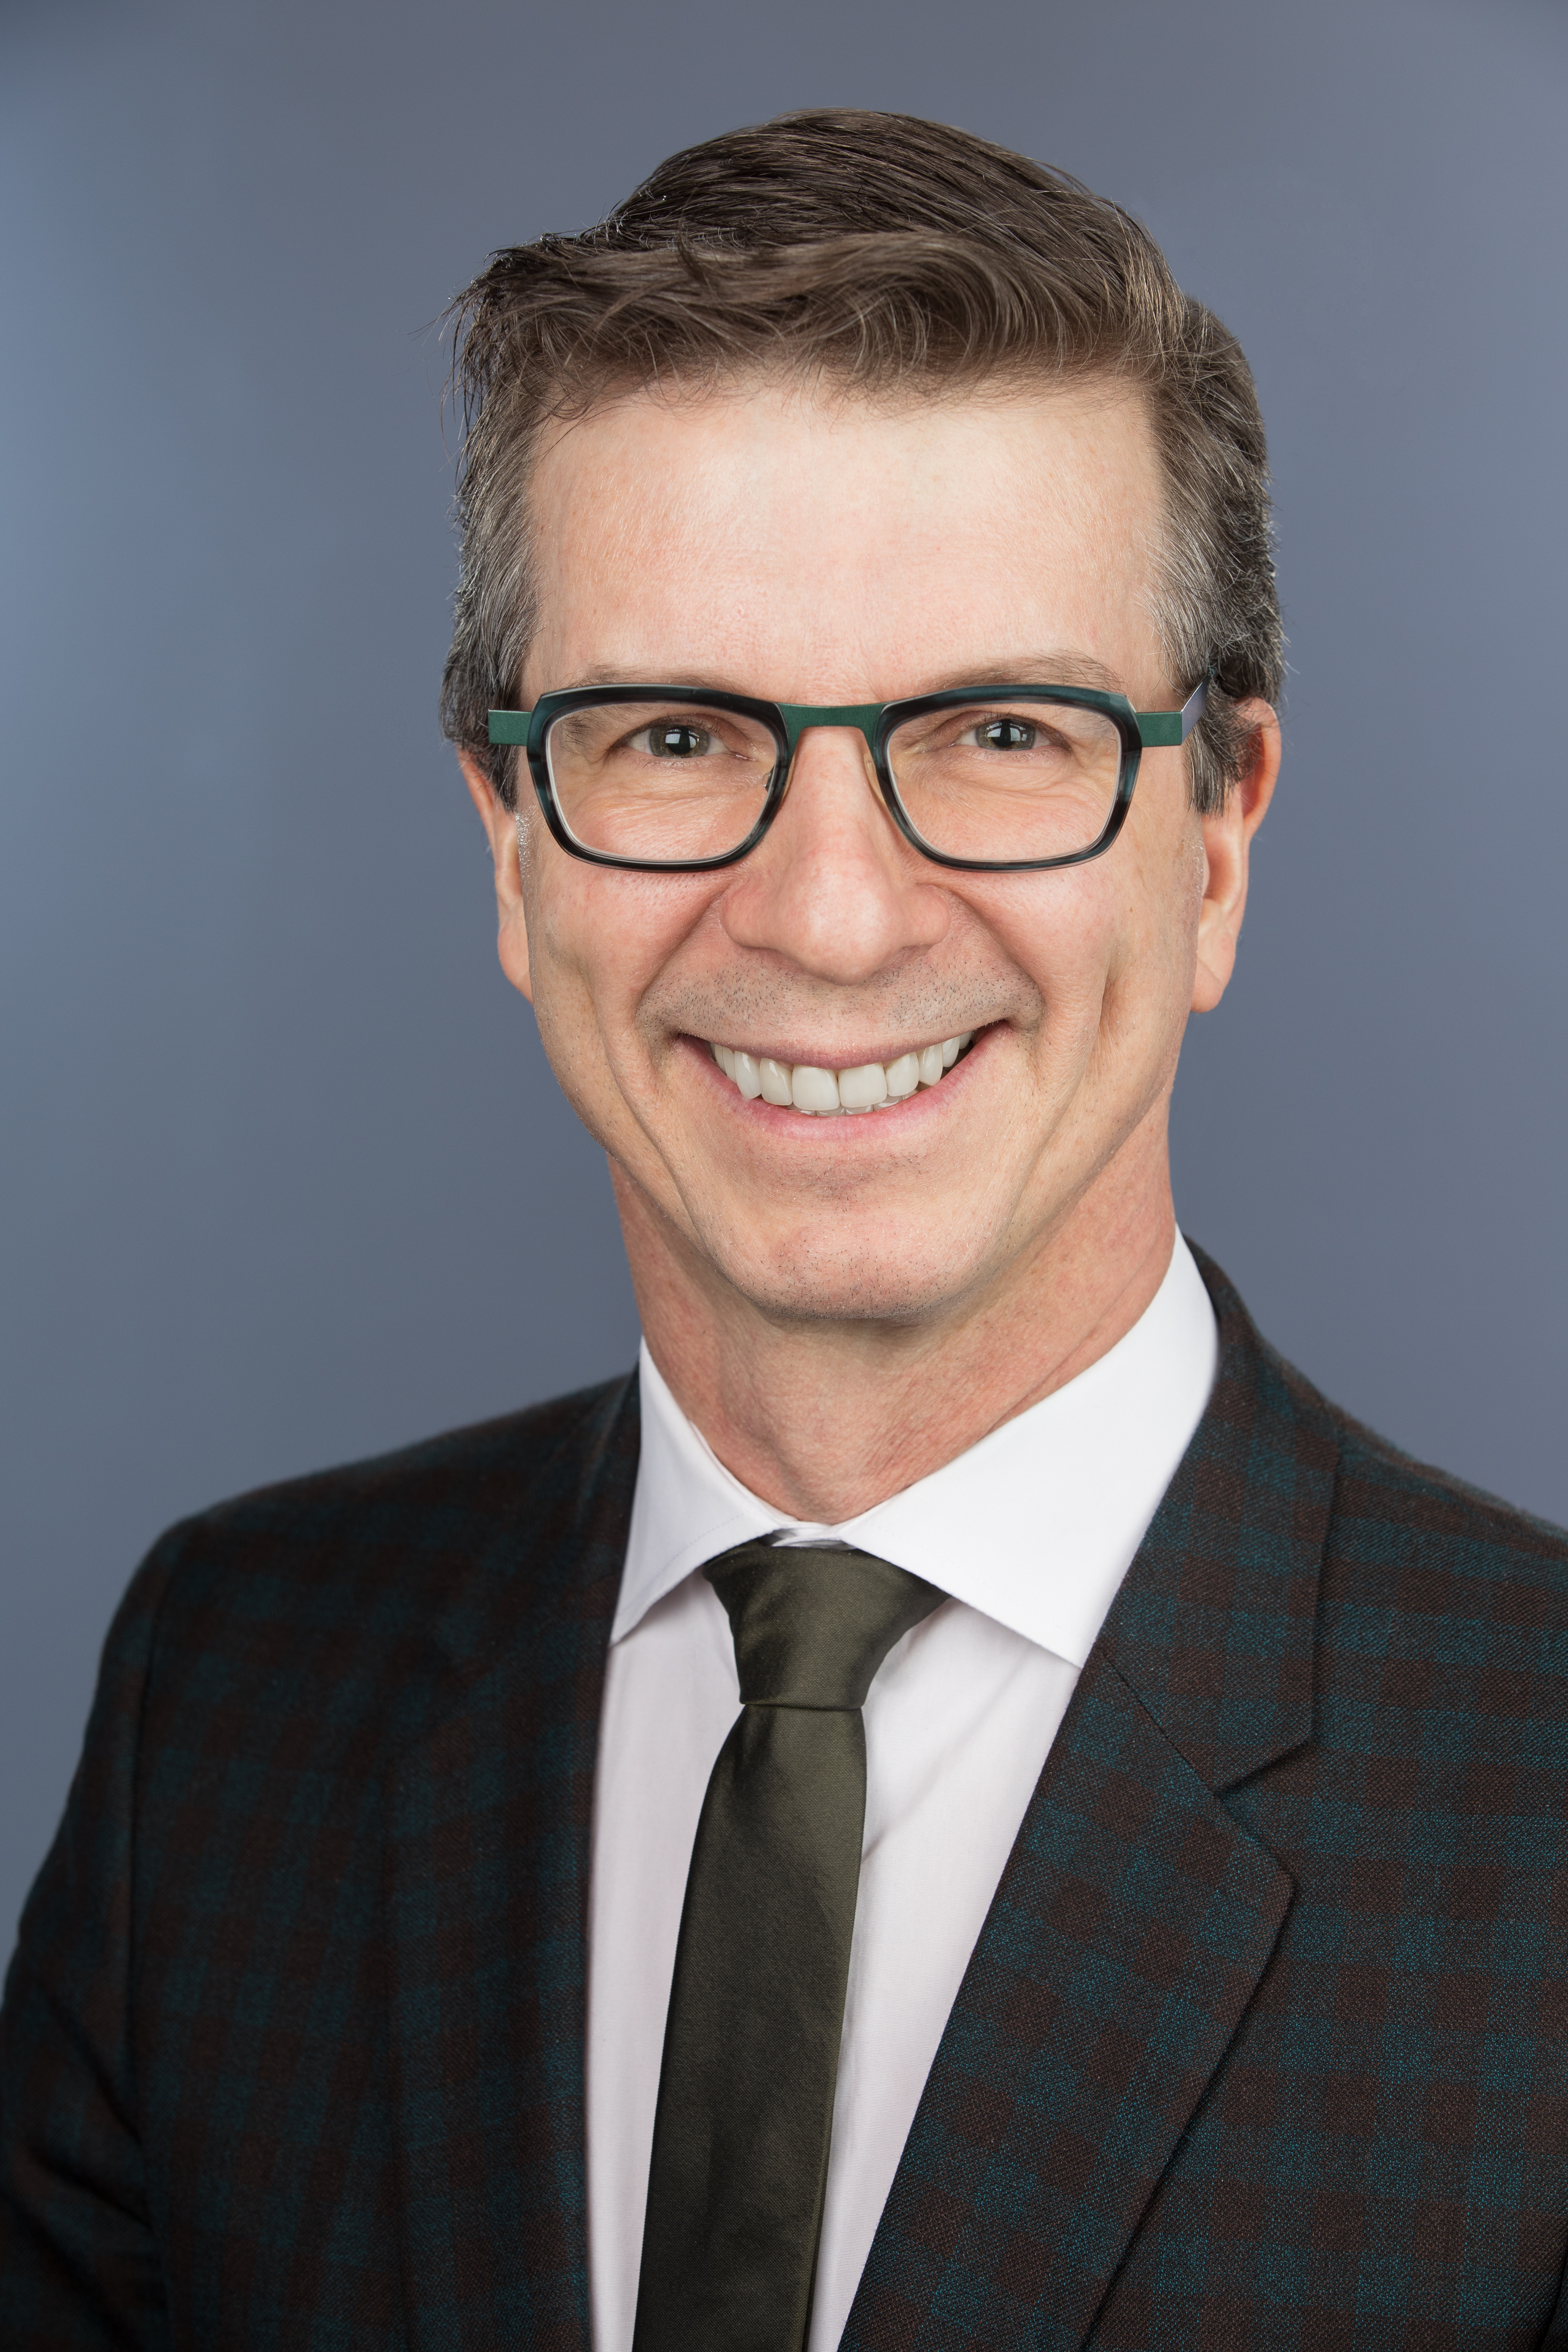 Dr. Alain Brassard